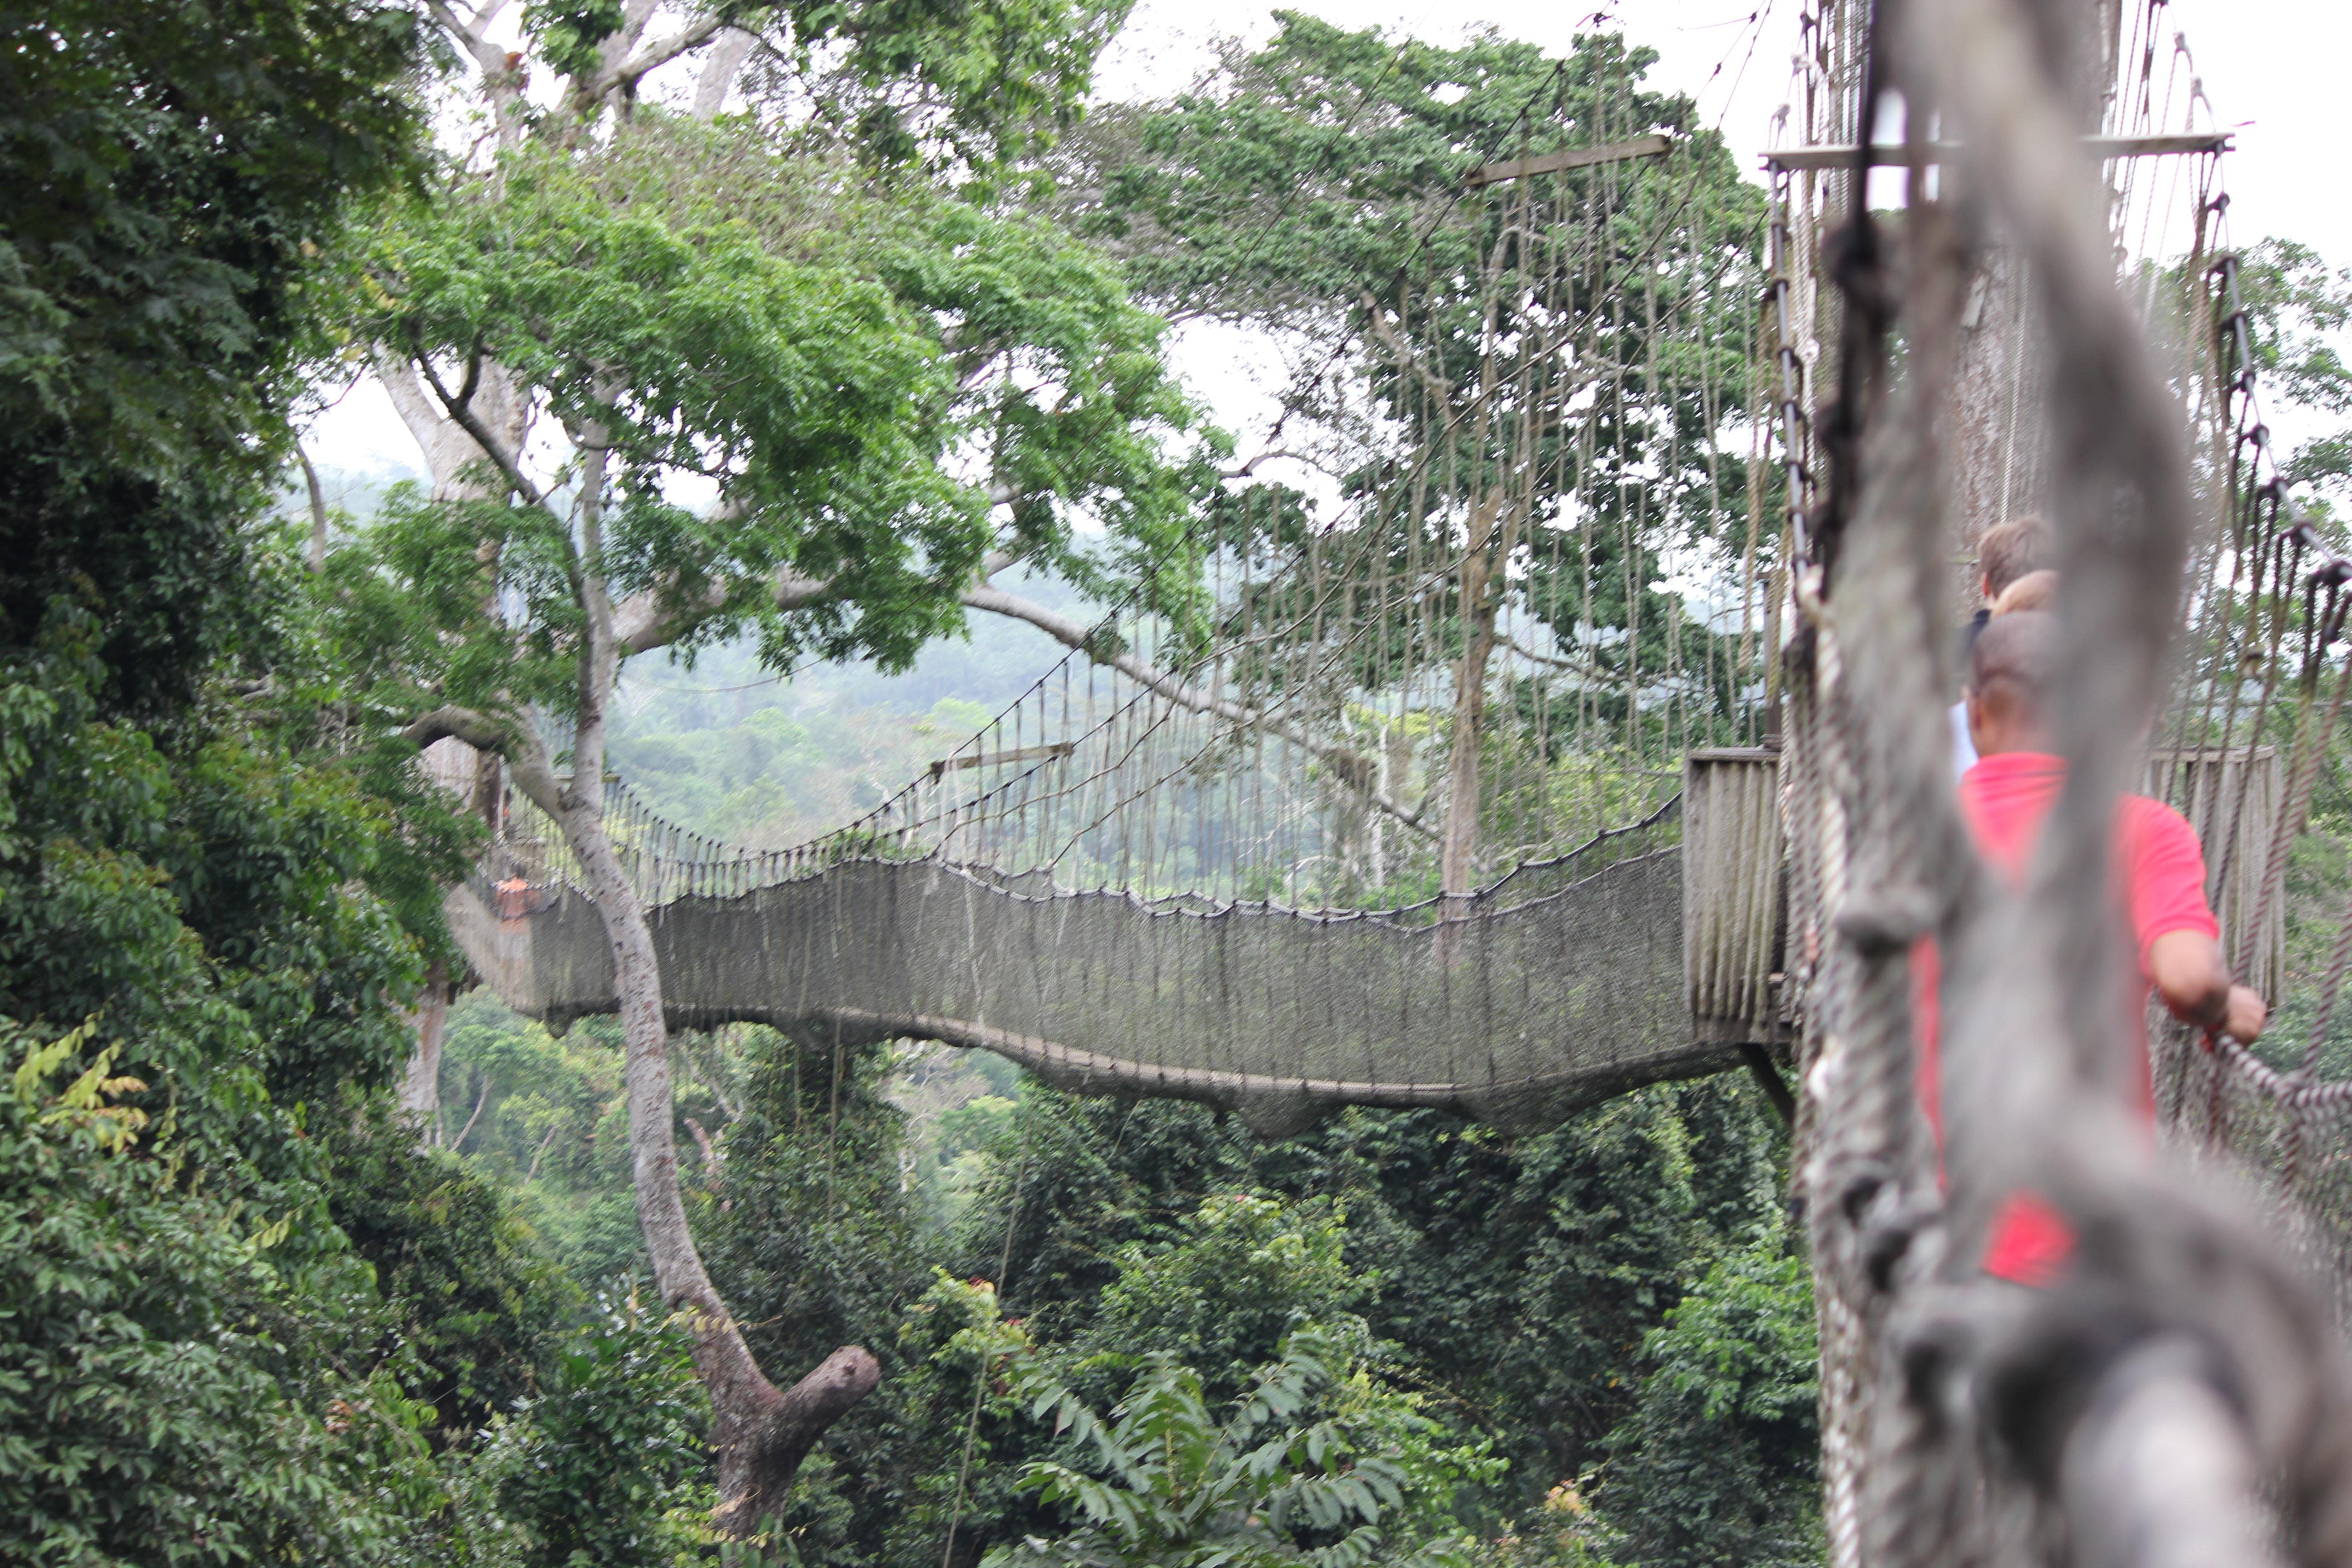 FileKakum Canopy Walk Kakum National Park Ghana.JPG & File:Kakum Canopy Walk Kakum National Park Ghana.JPG - Wikimedia ...